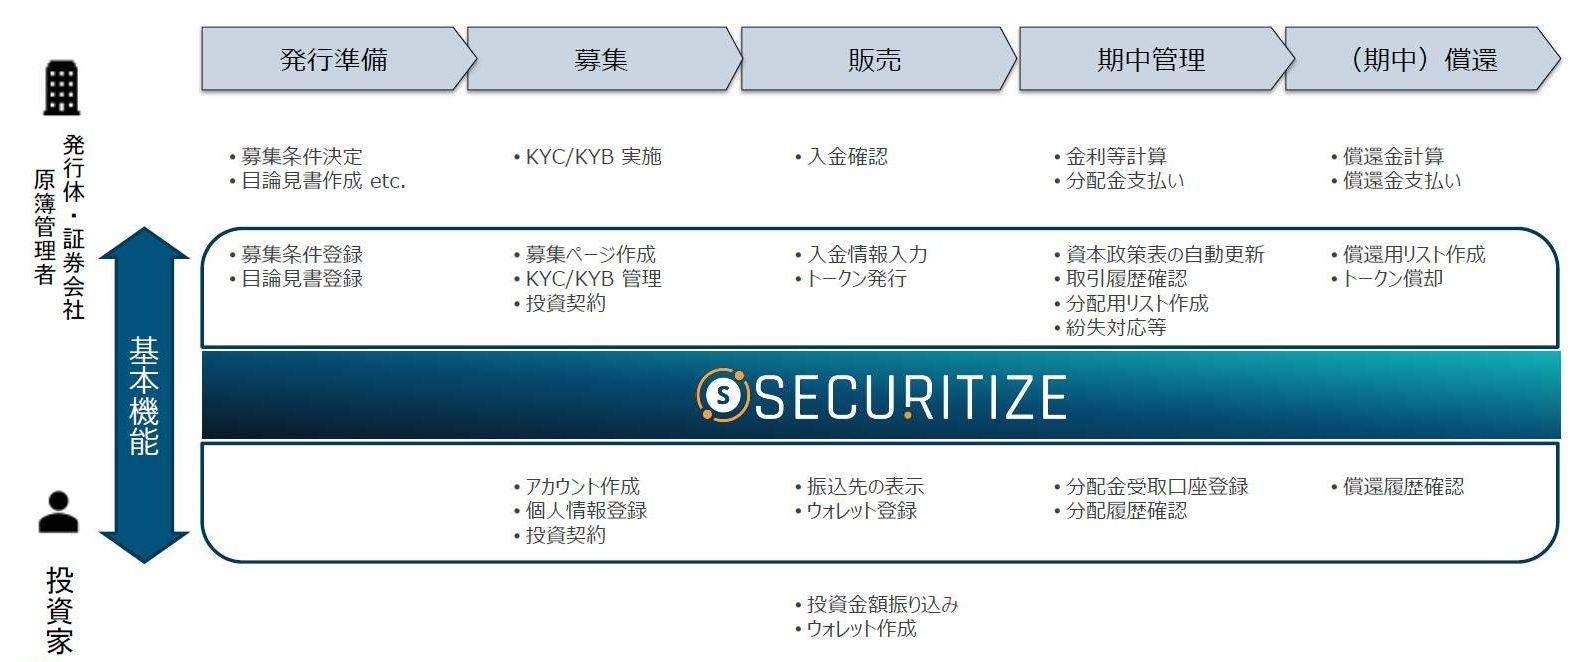 Securitize Platformがカバーする機能